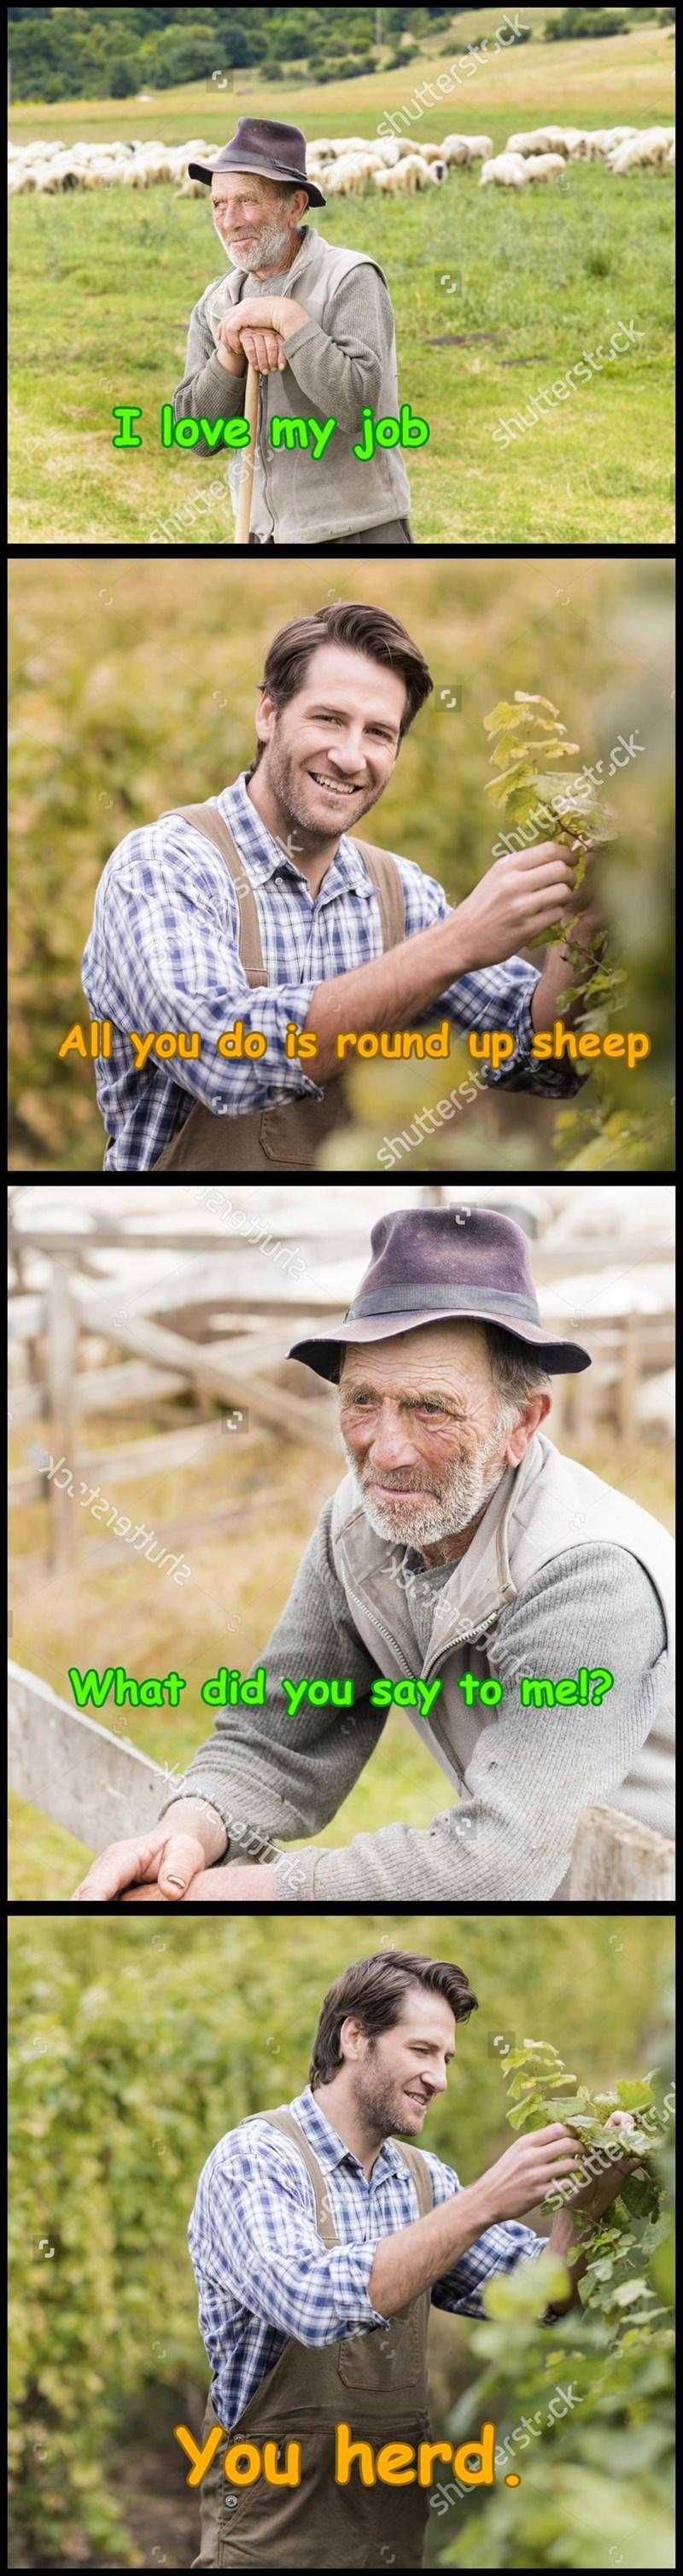 youdontsurf